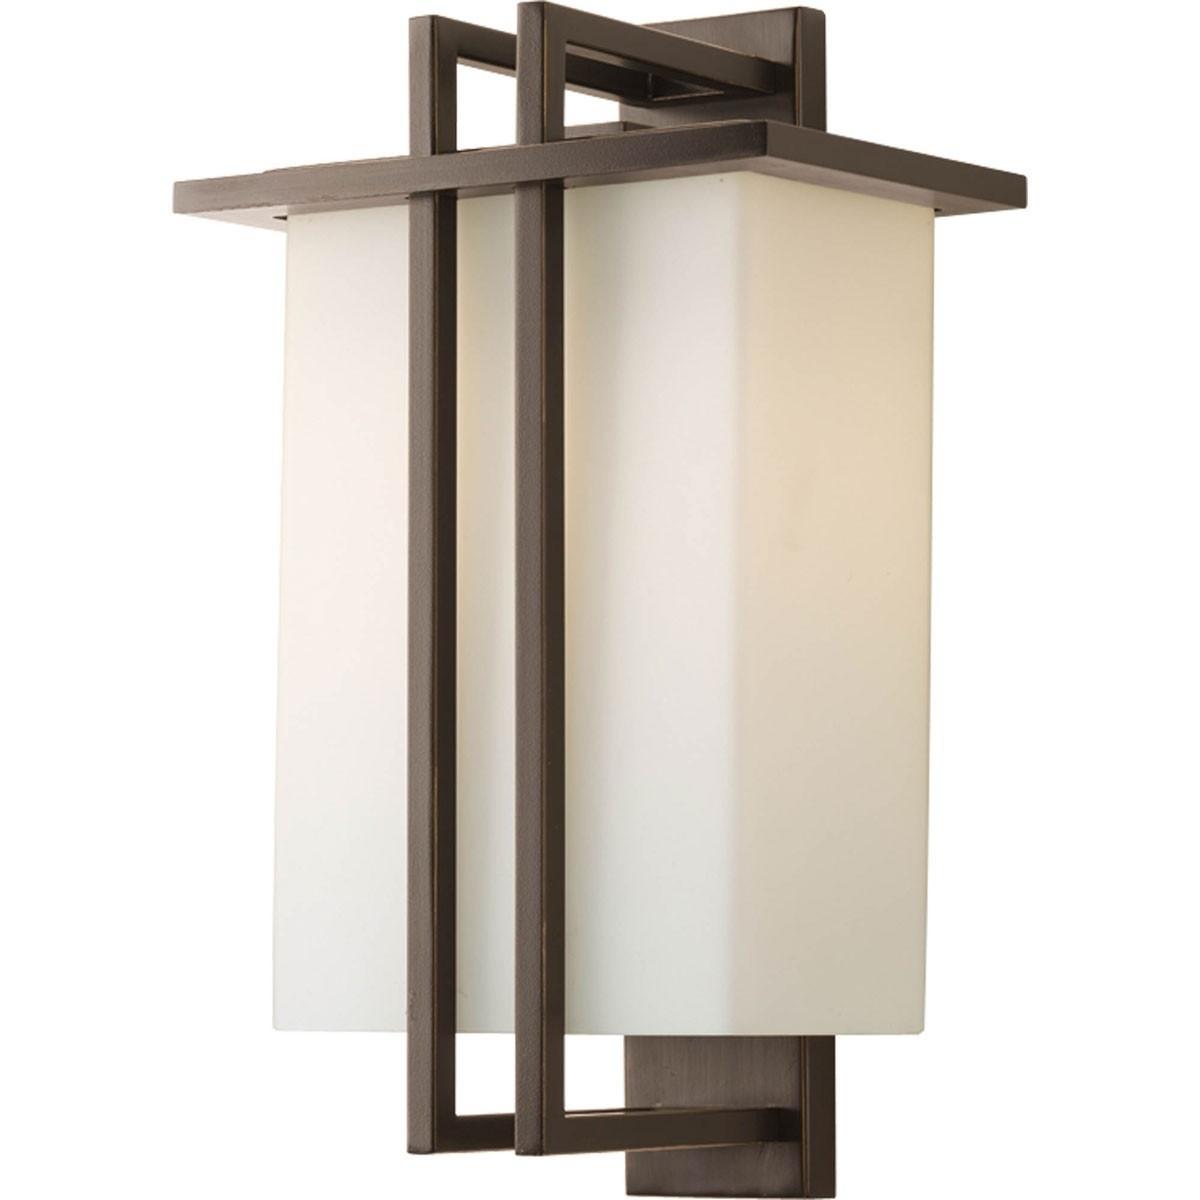 Outdoor Wall Lantern Lighting In 2019 One Lamp Outdoor Medium Wall Lantern Light Fixture – Progress (View 9 of 20)